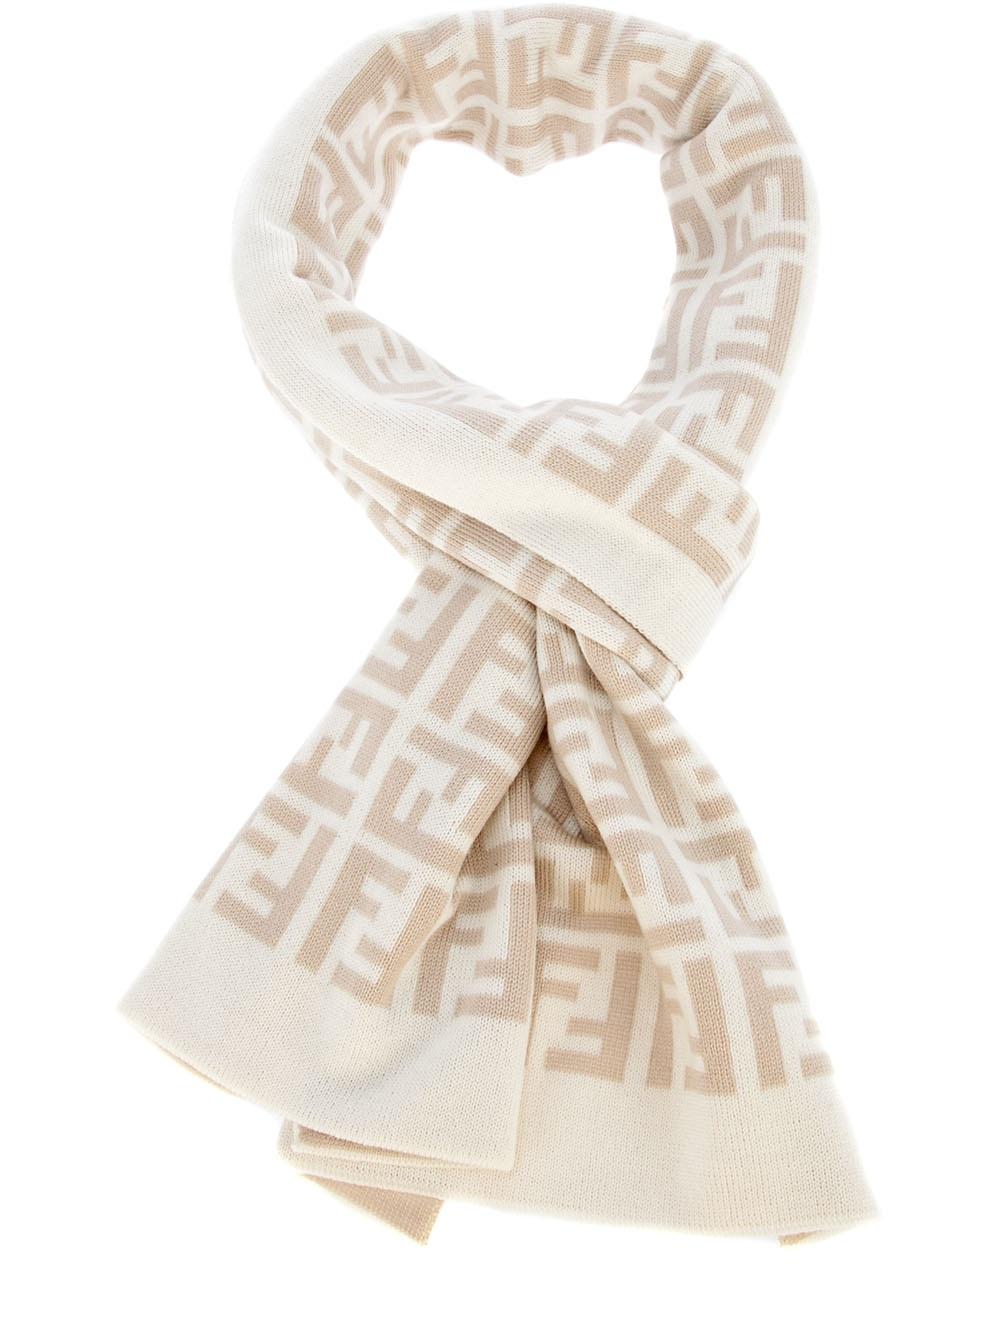 c4d0572847b ... czech fendi monogram scarf in natural for men lyst 58432 dfe50 reduced  fendi 15480 stripes scarf ff zucca logo ...